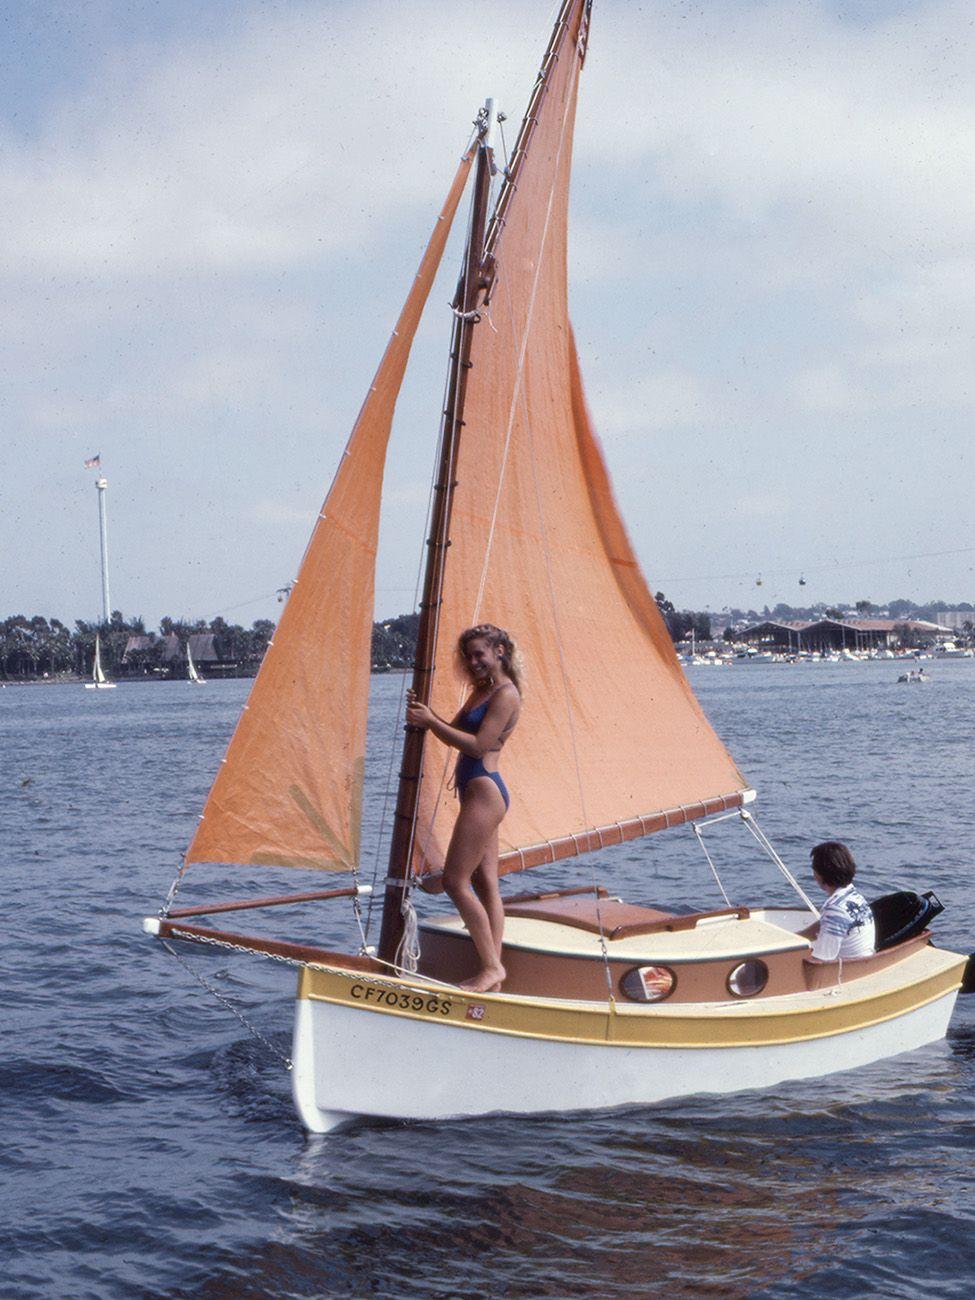 pocket cruiser sailboat - Поиск в Google   Sailing dinghy ...